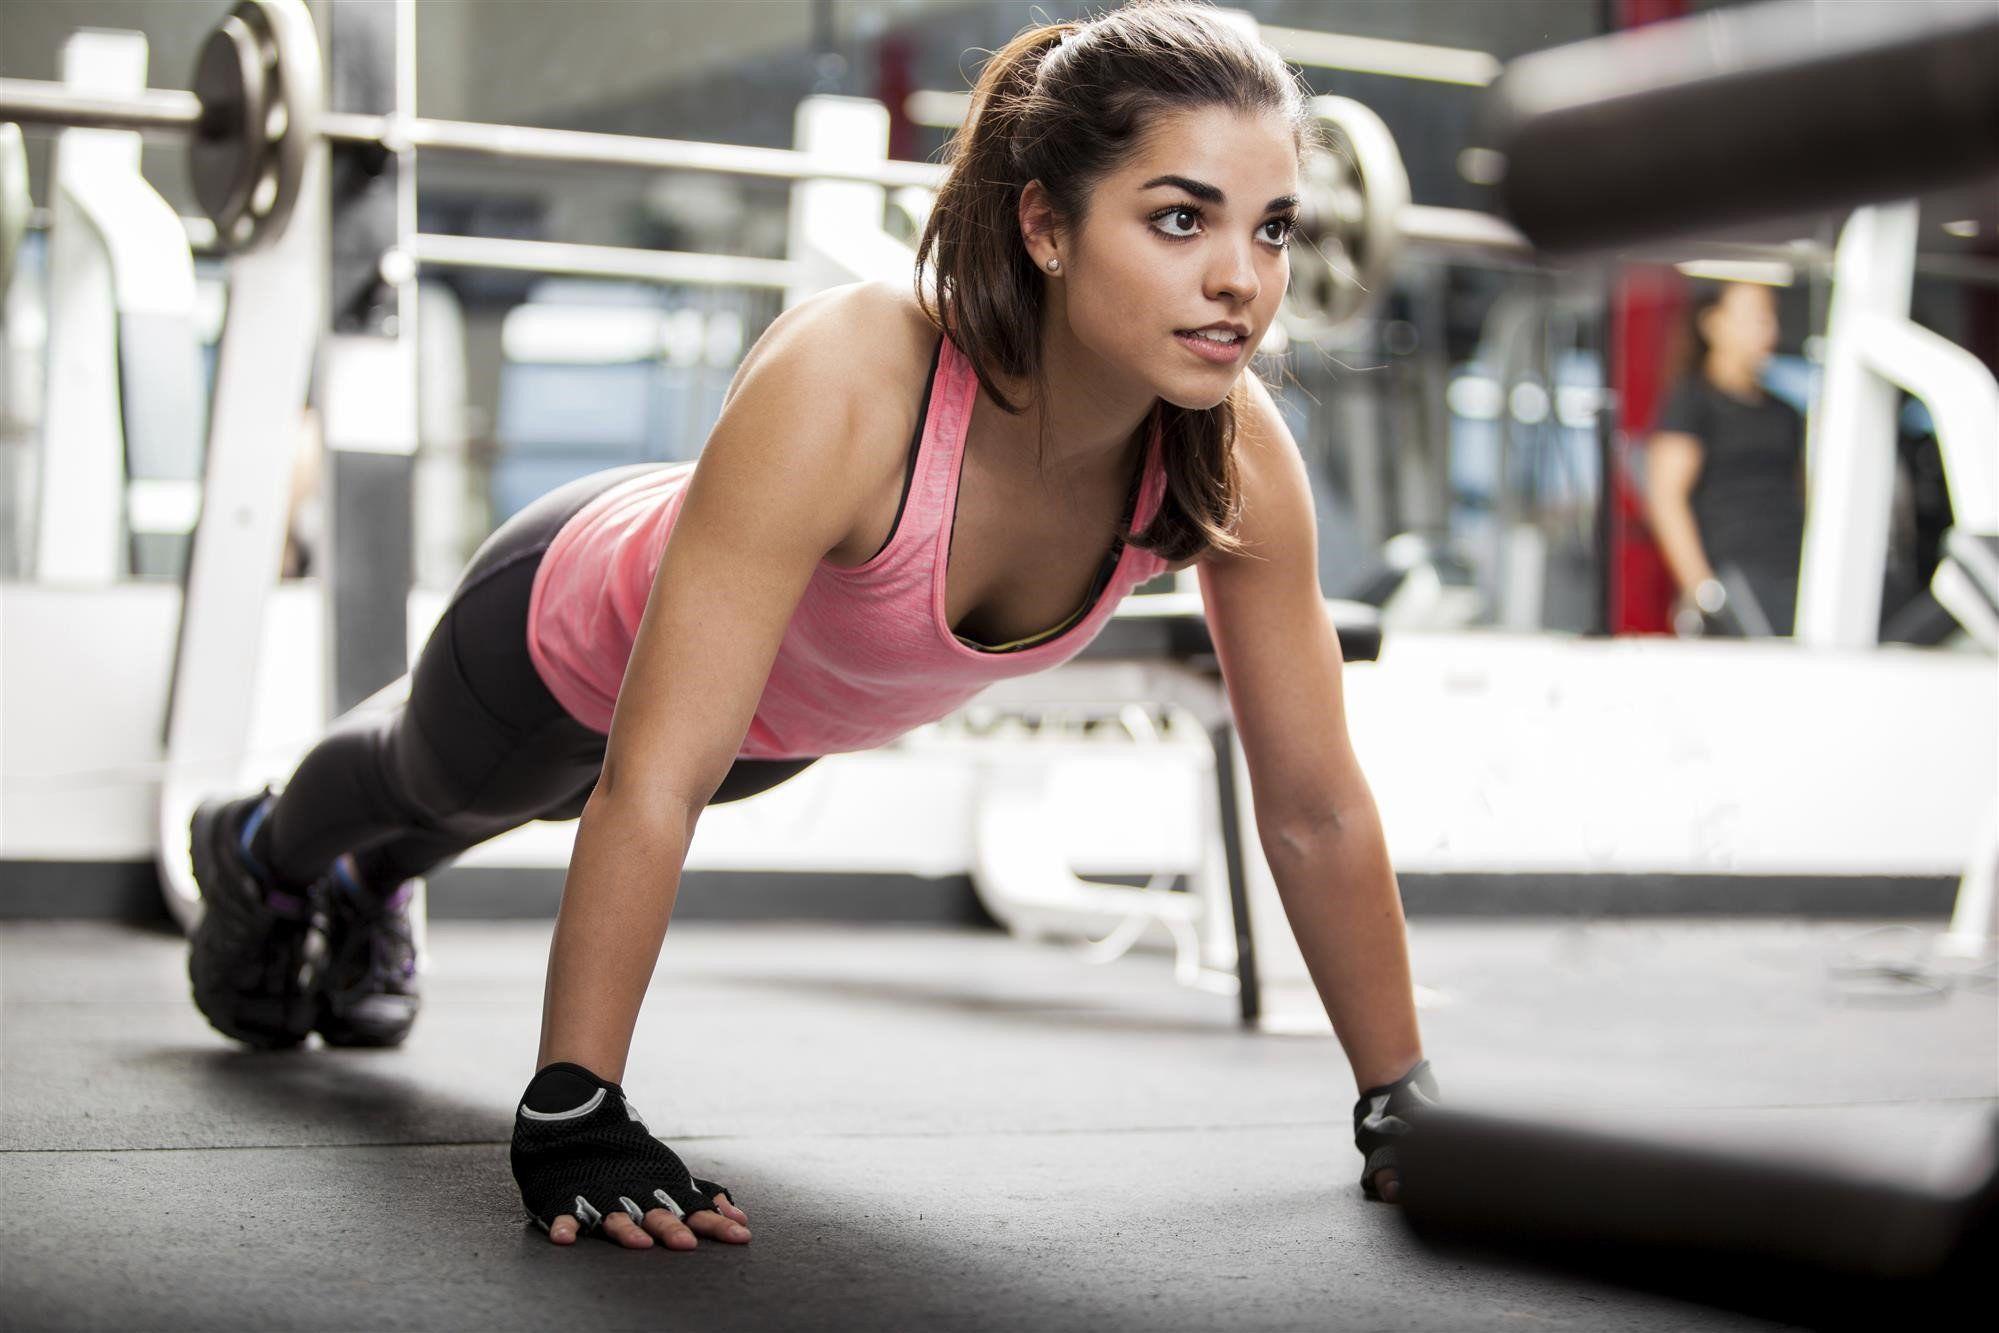 woman-doing-pushups-2fb7501ea9b2b613329bc21aa1336f75.jpg